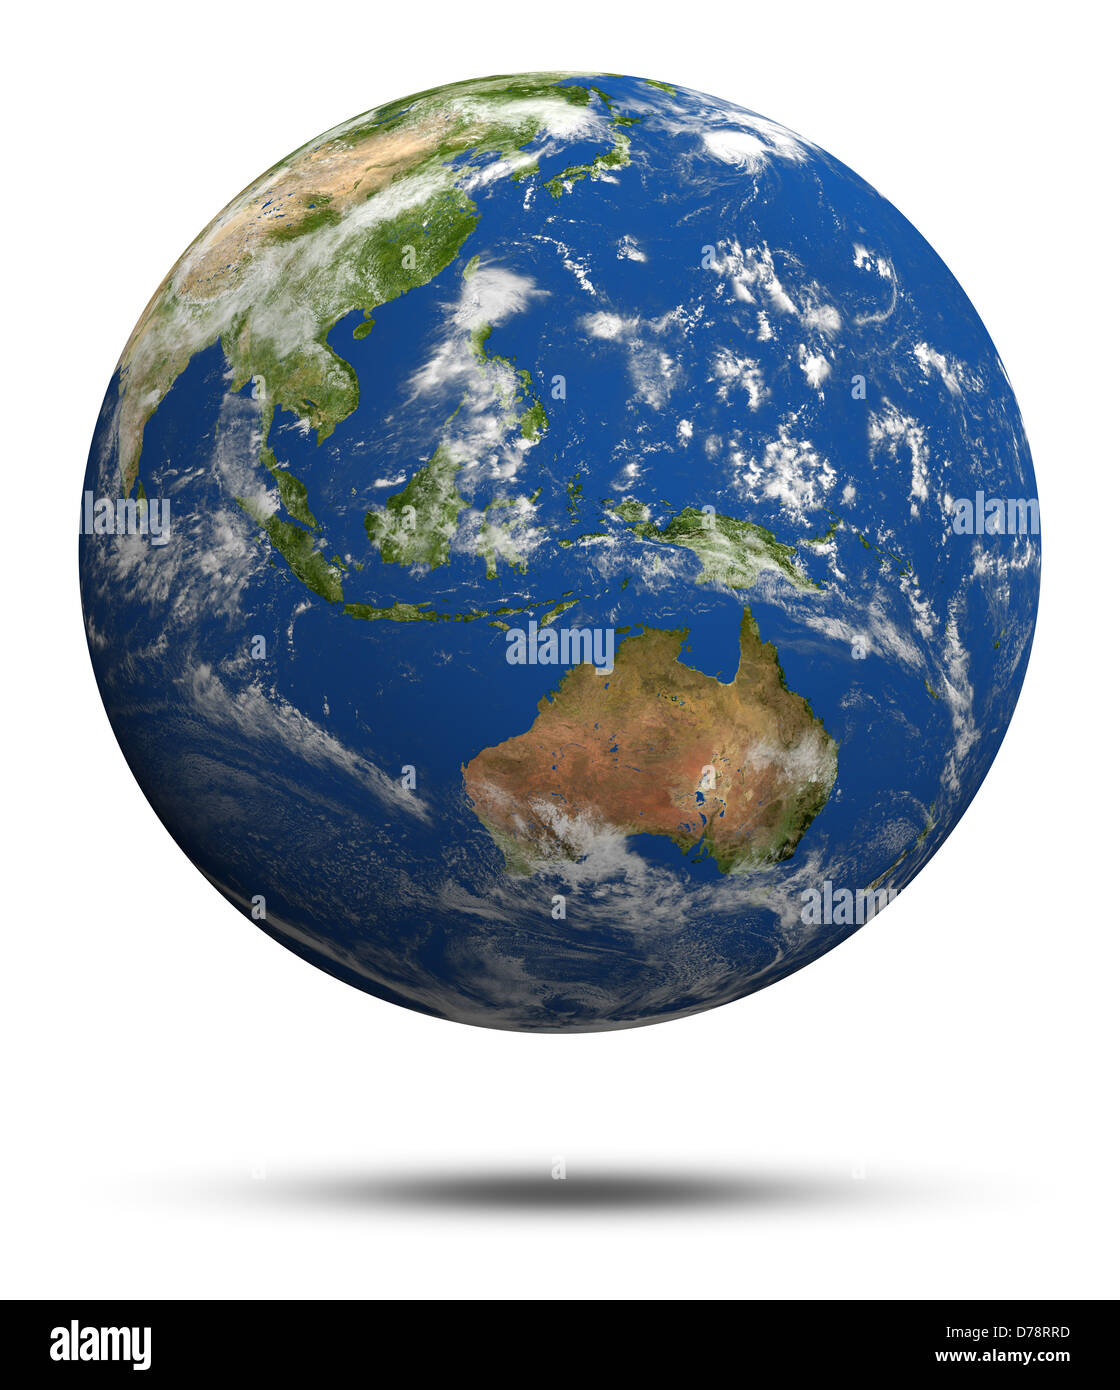 australia and oceania earth globe model maps courtesy of nasa